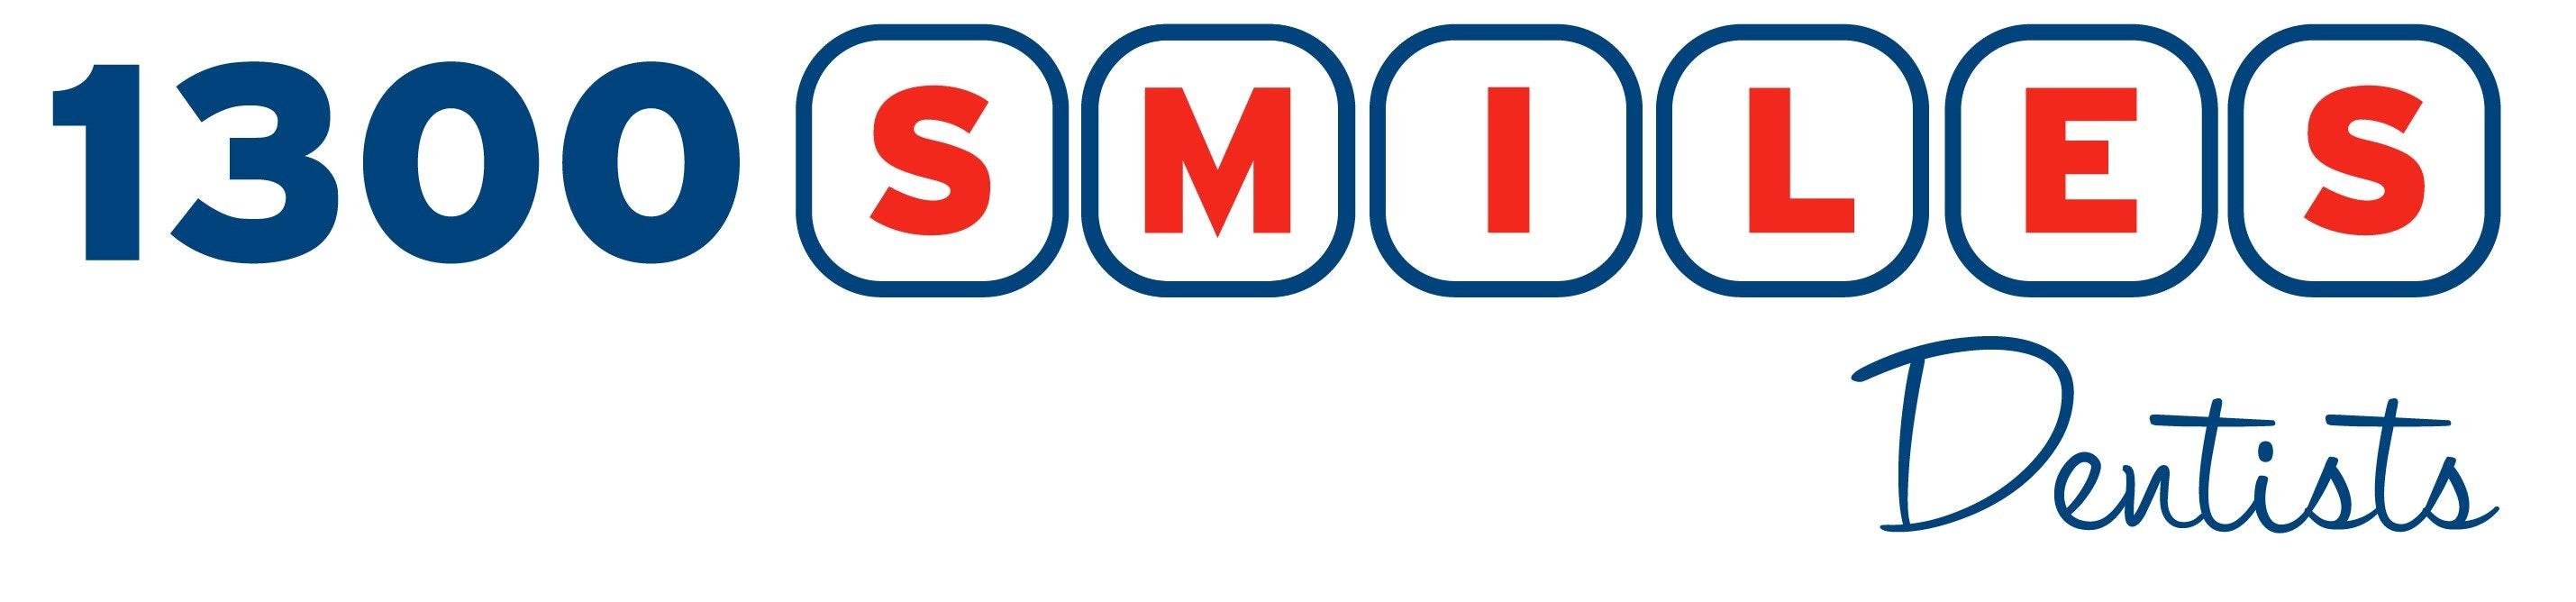 logo for .1300 Smiles - Douglas Dentists